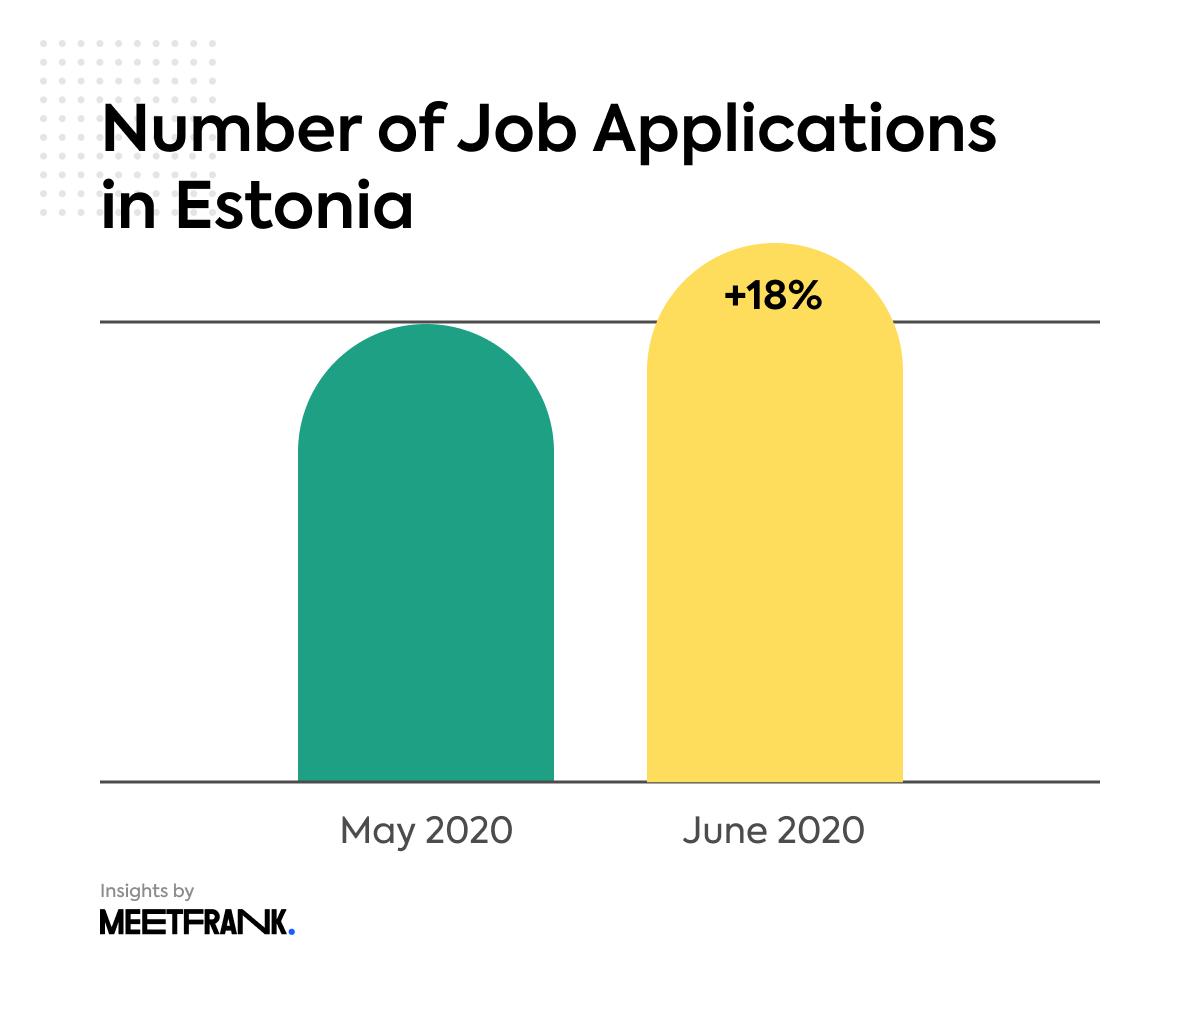 the job openings in Estonia